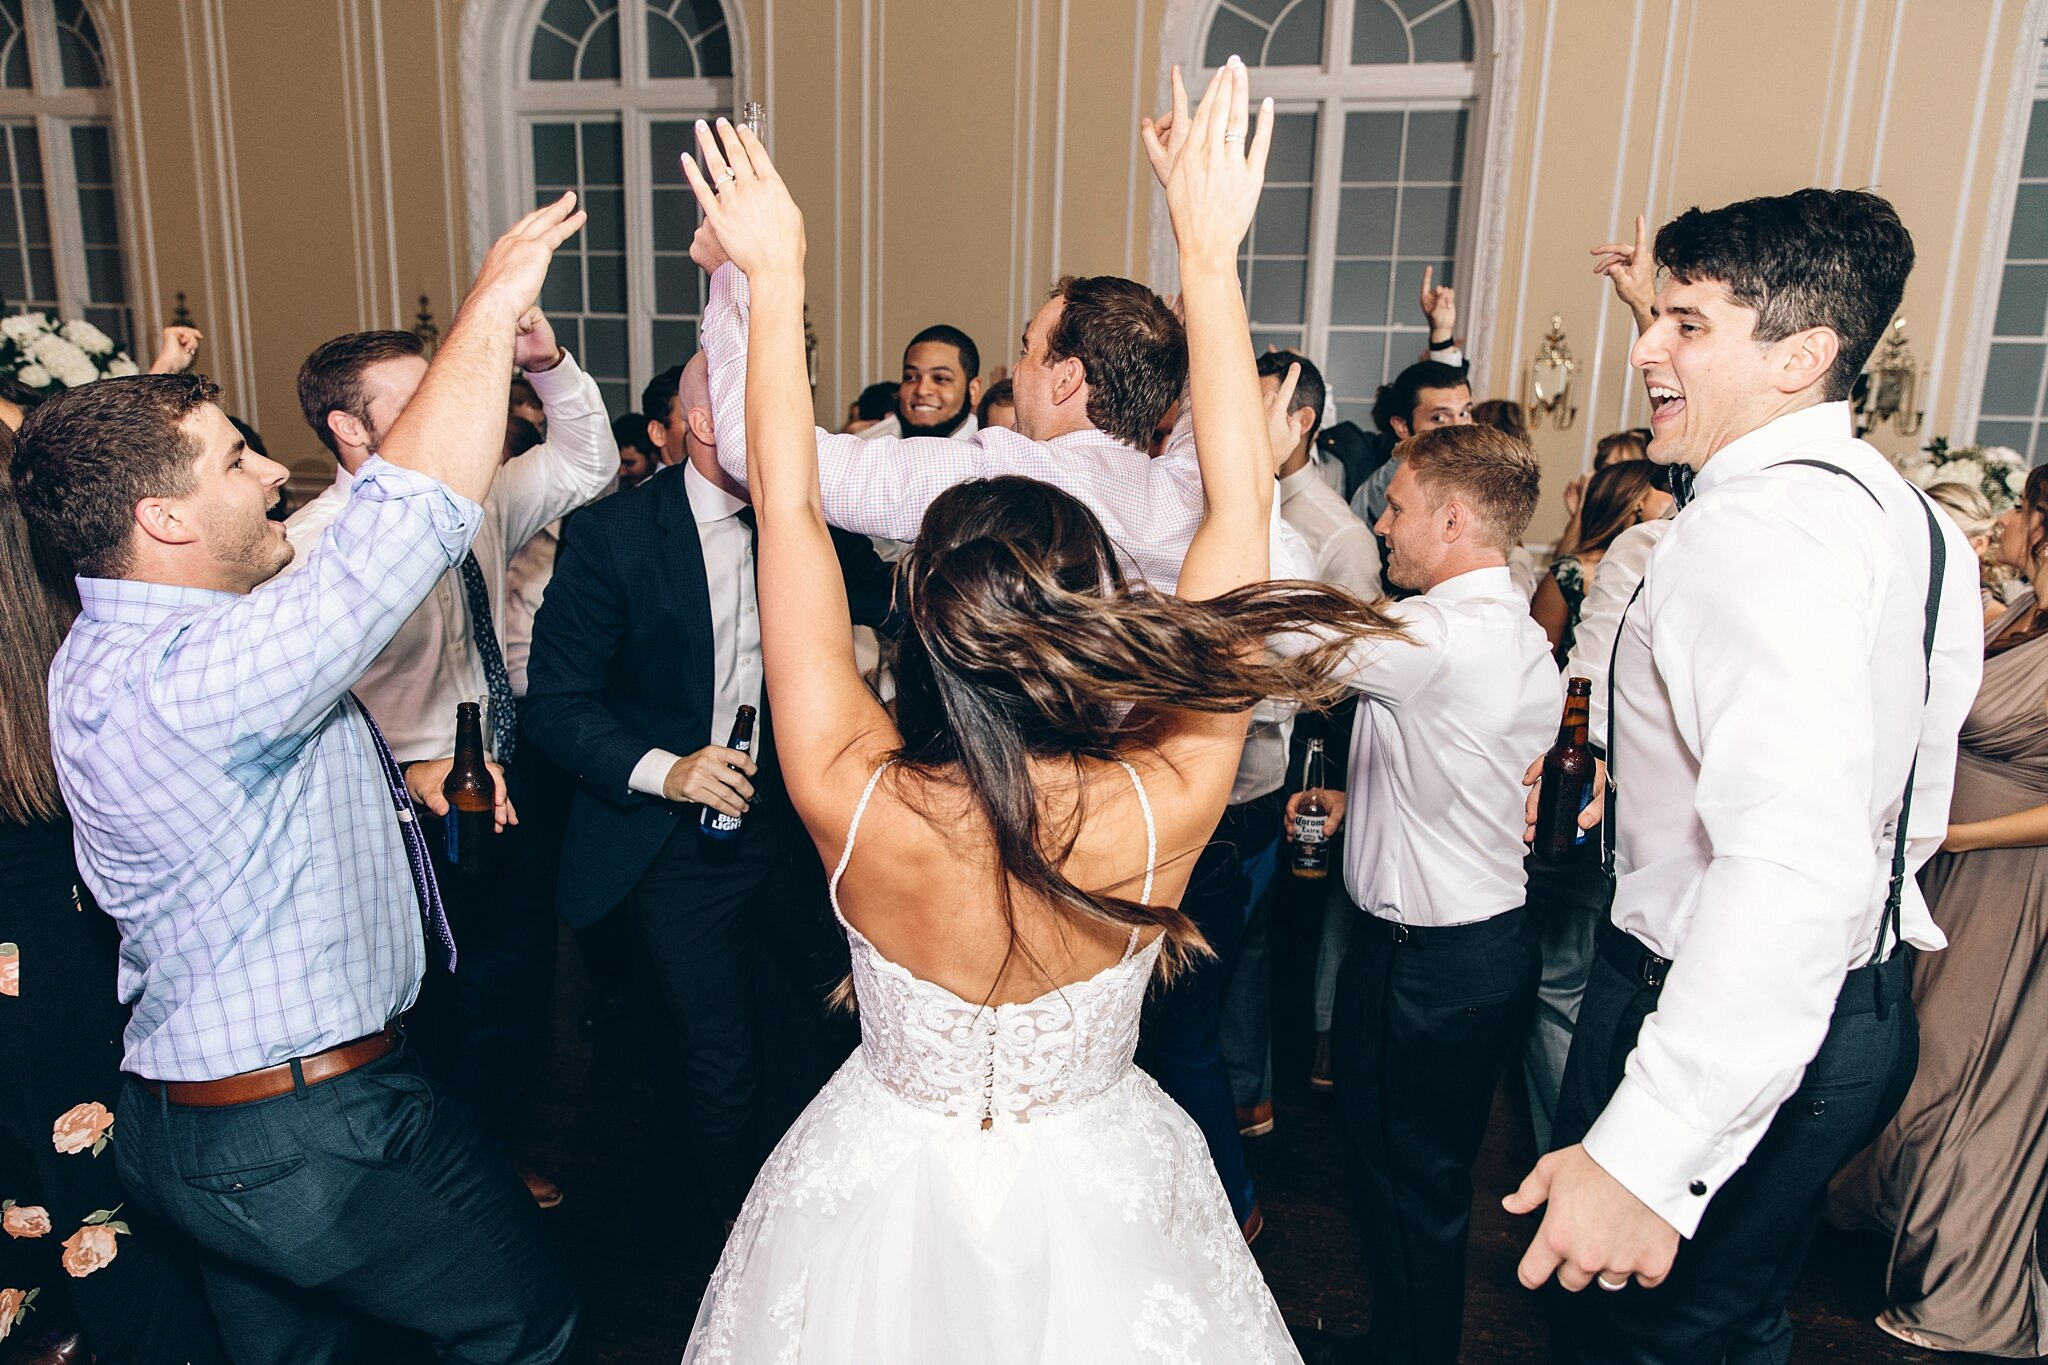 patrick-henry-ballroom-wedding-roanoke_0562.jpg